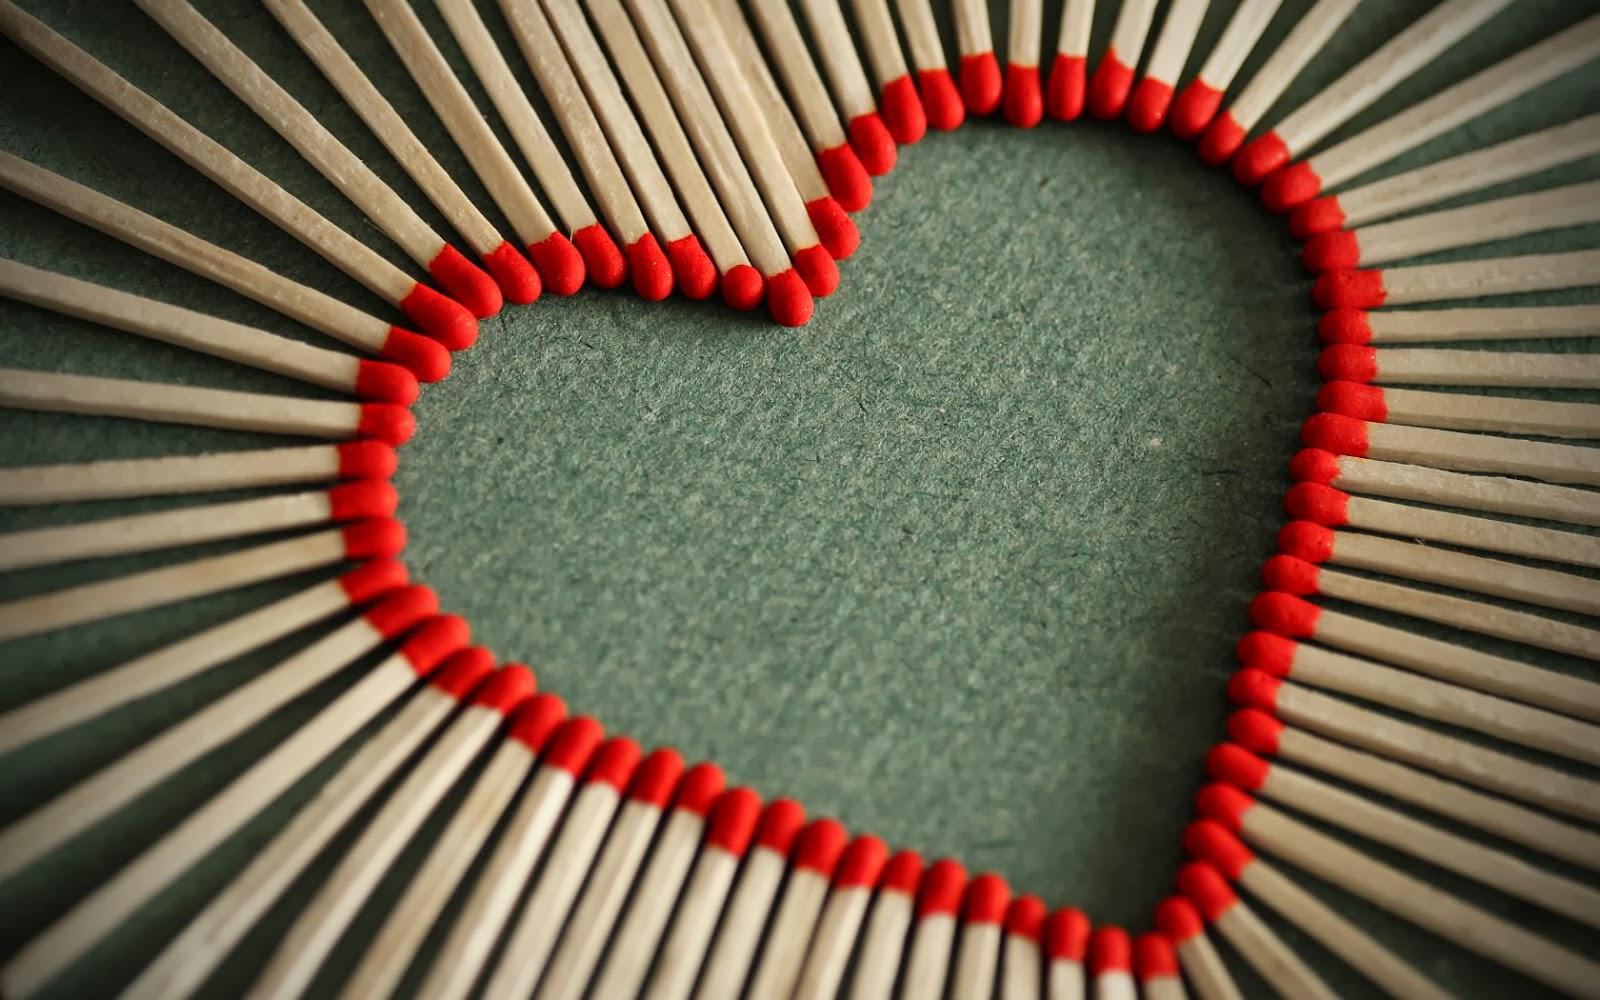 بالصور صور قلب حب , اجمل صور قلوب 3317 10